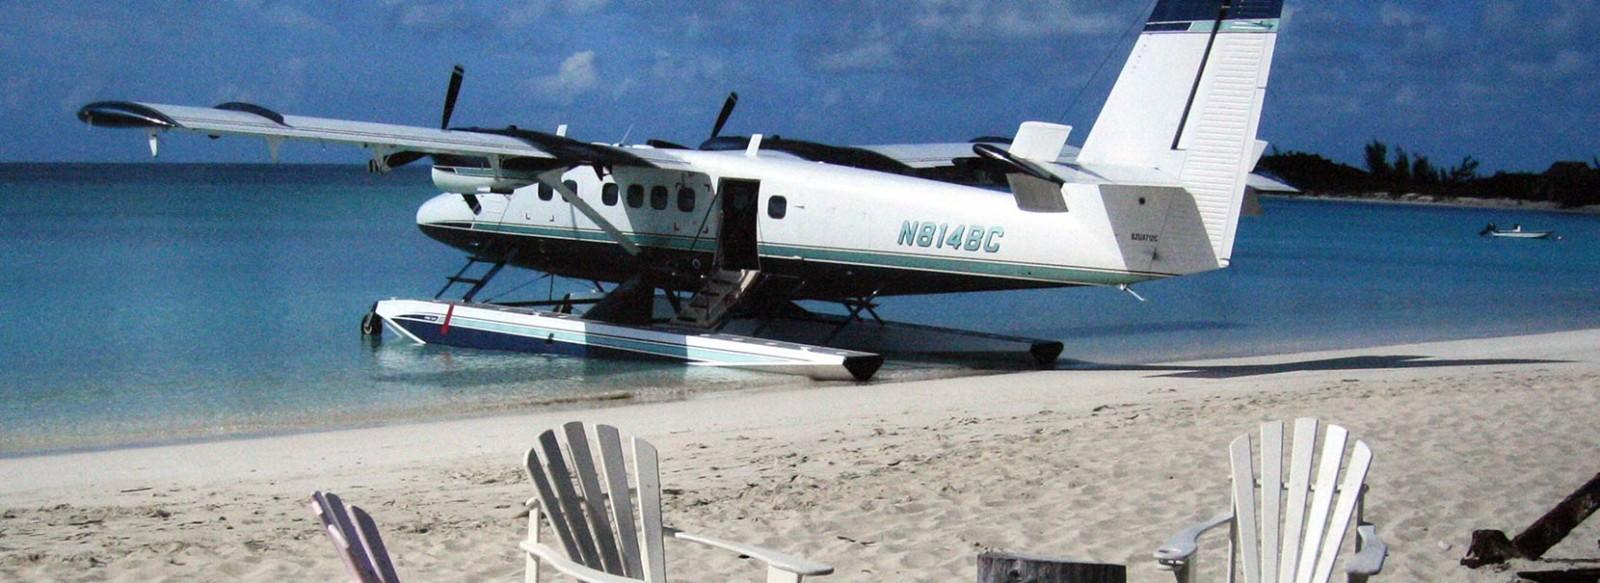 de Havilland Twin Otter DHC-6   Wipaire, Inc